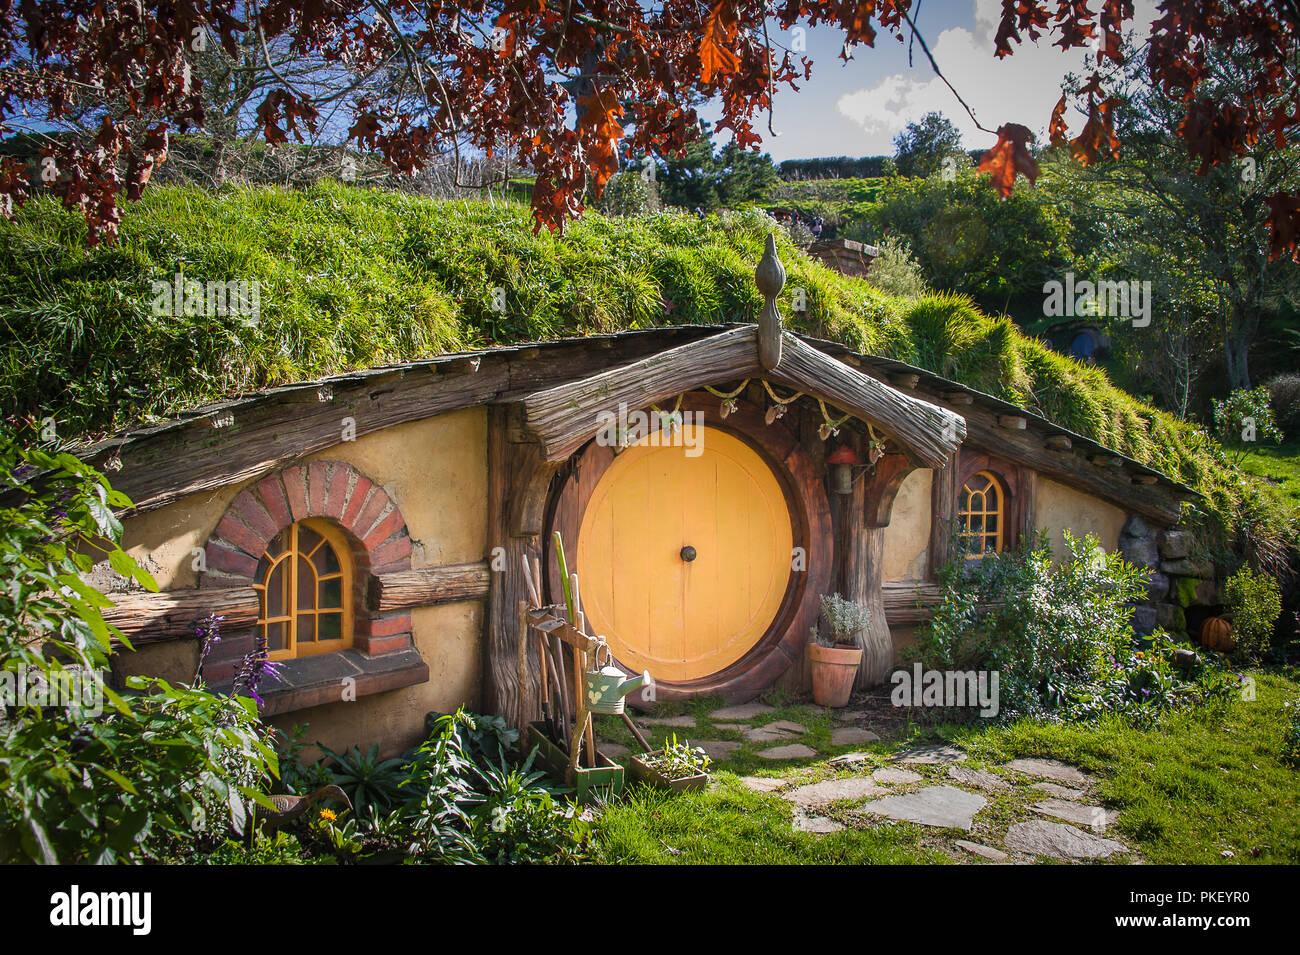 hobbit house stock photos hobbit house stock images alamy. Black Bedroom Furniture Sets. Home Design Ideas